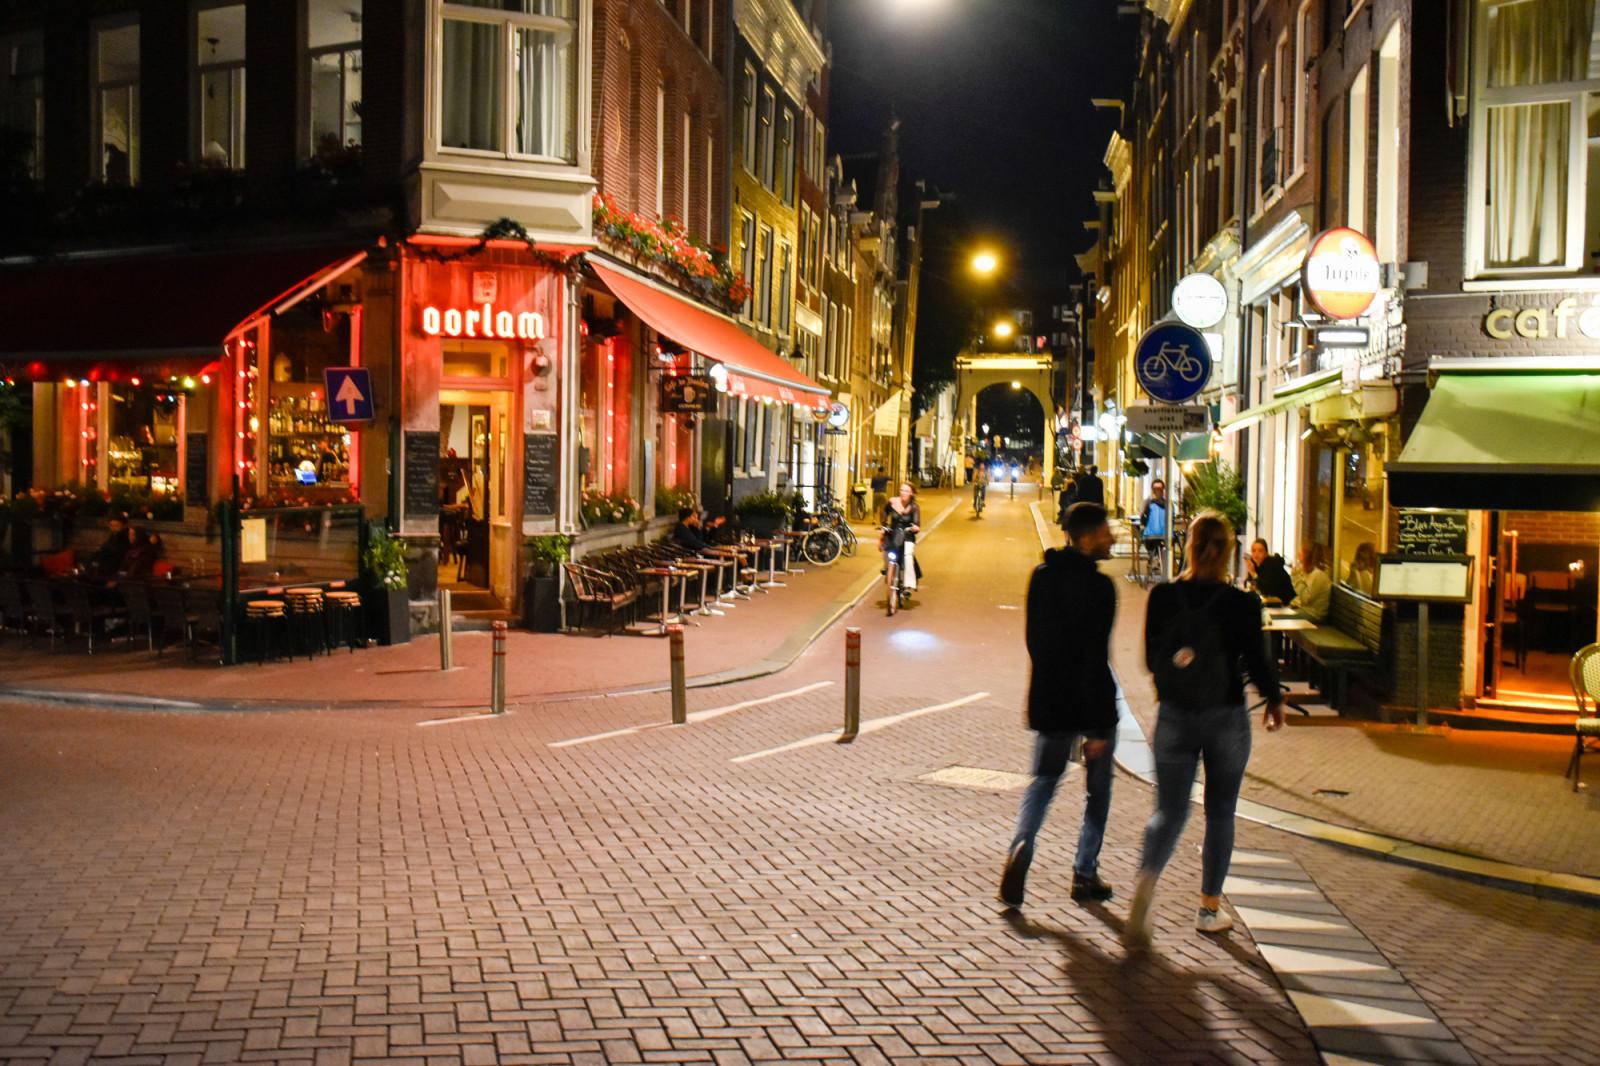 Amsterdam photo tour by night